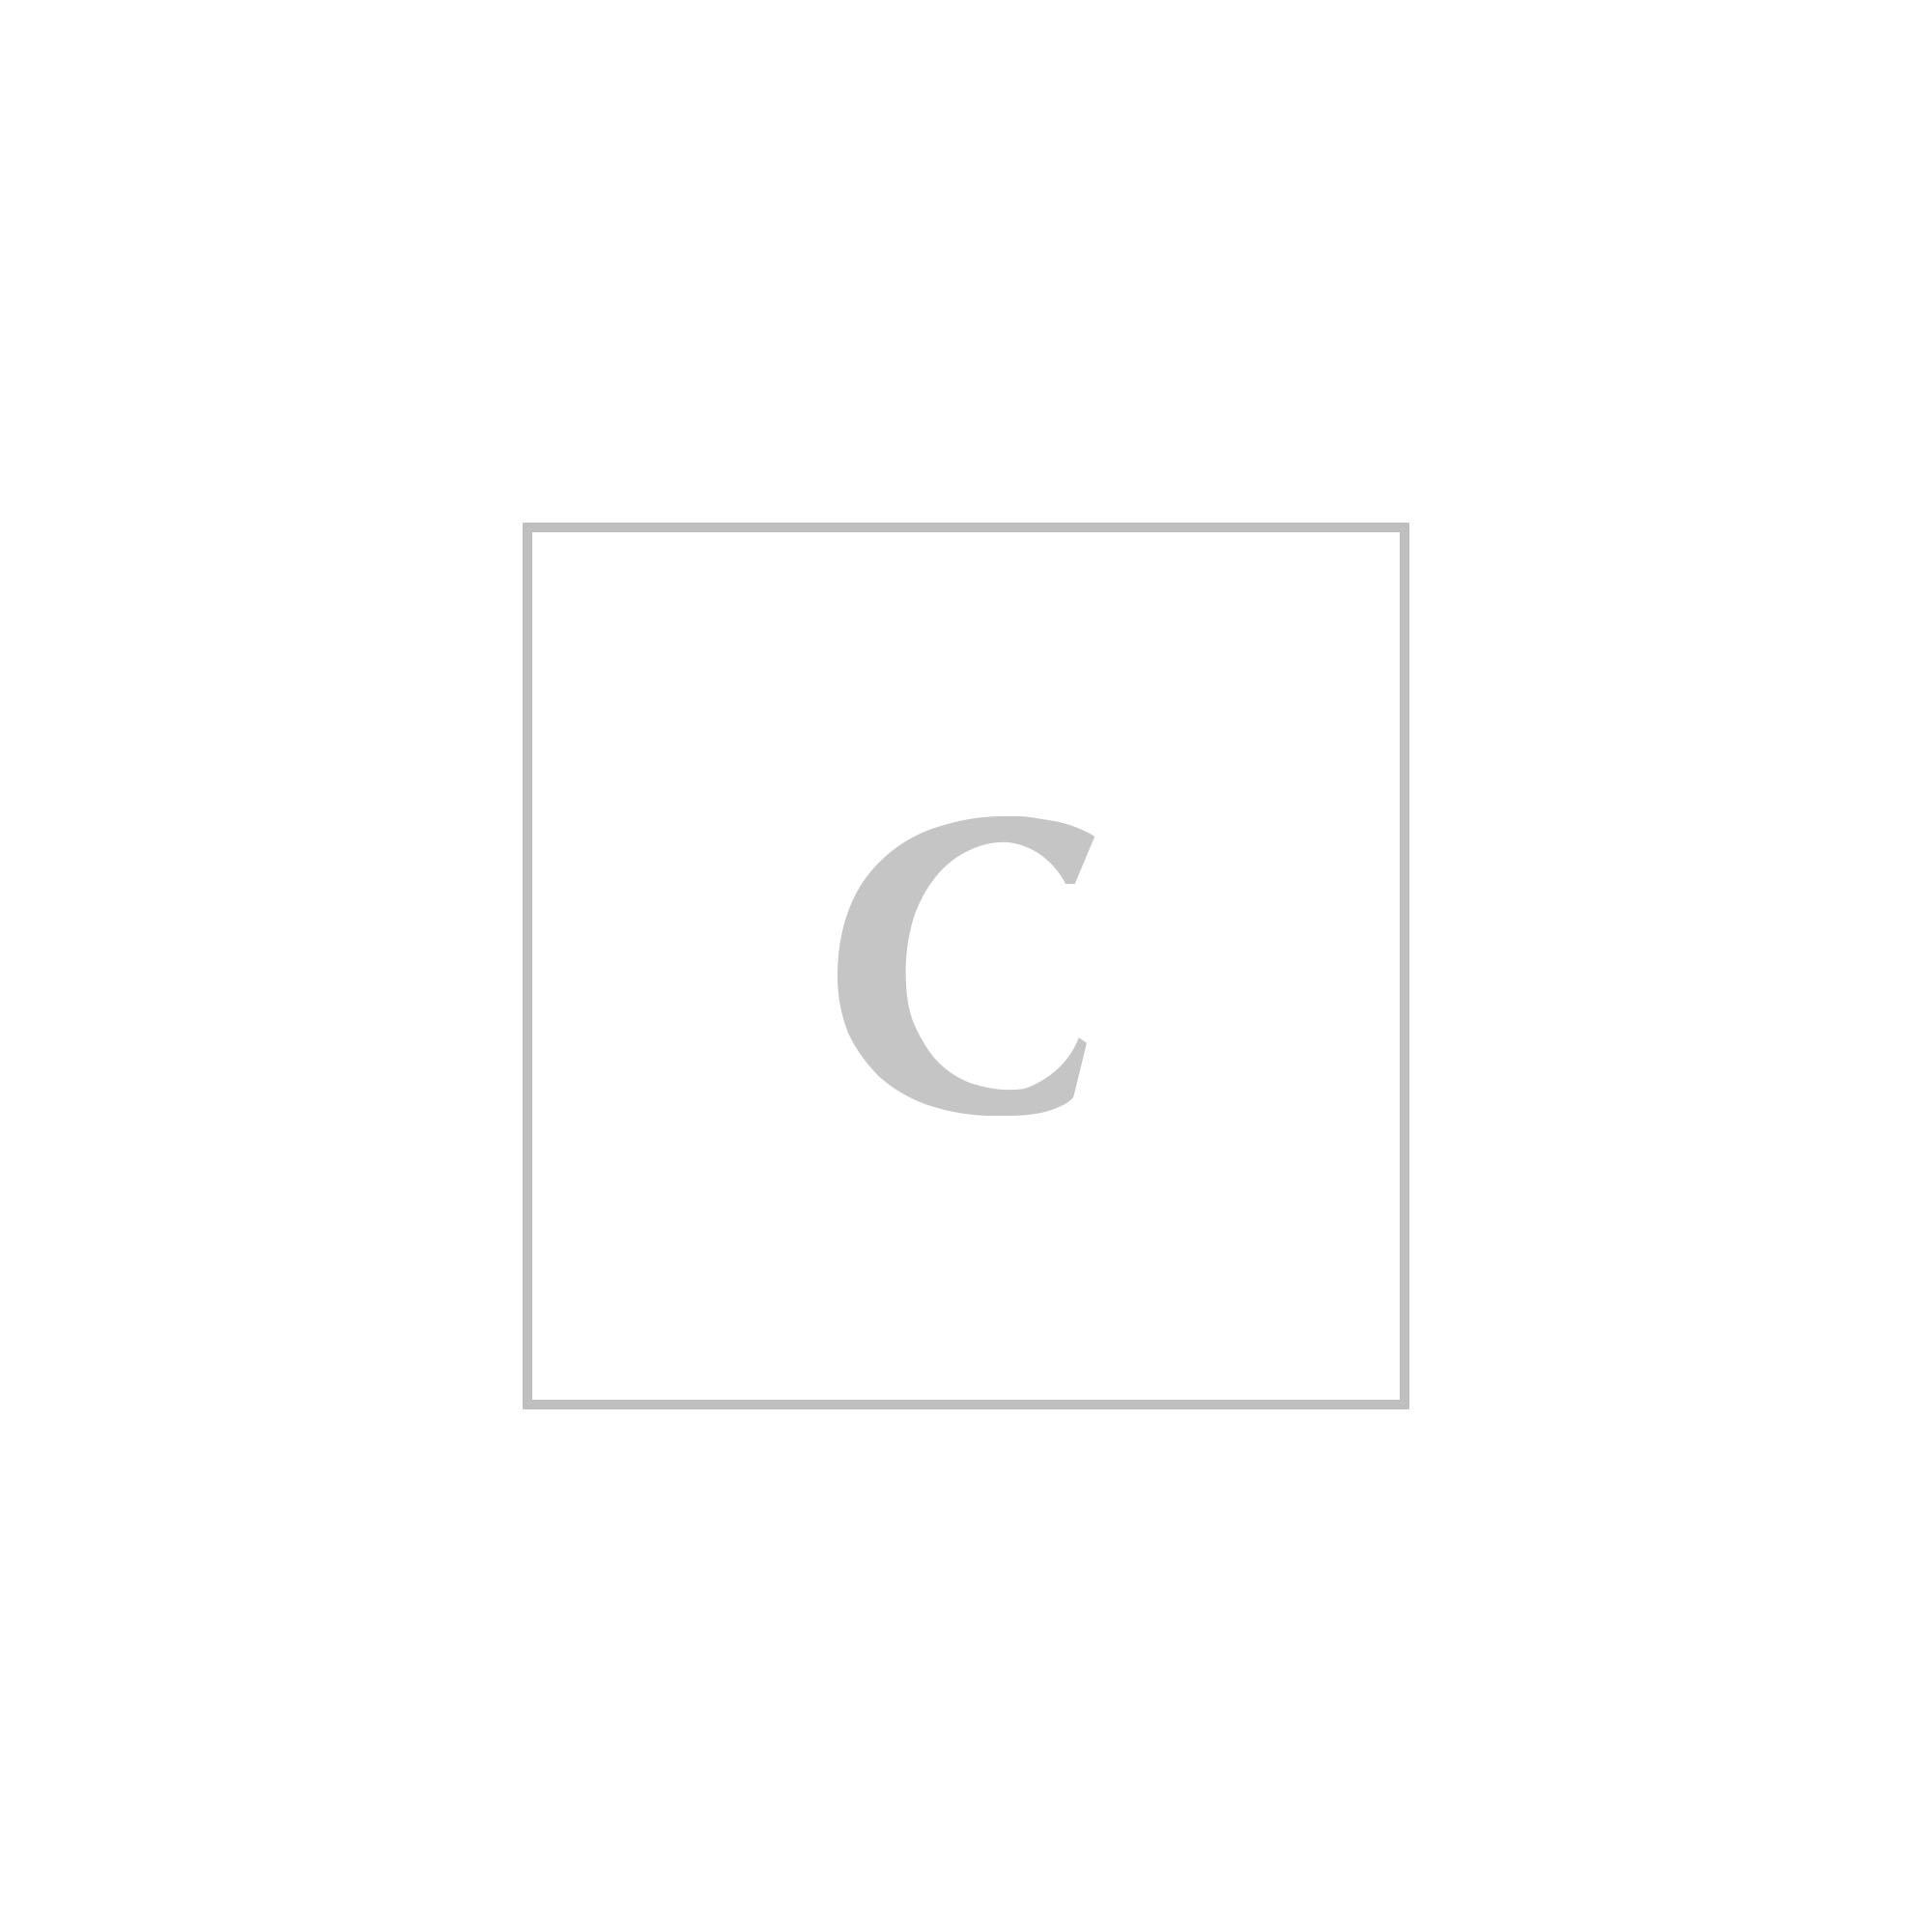 Saint laurent ysl collana monogramme